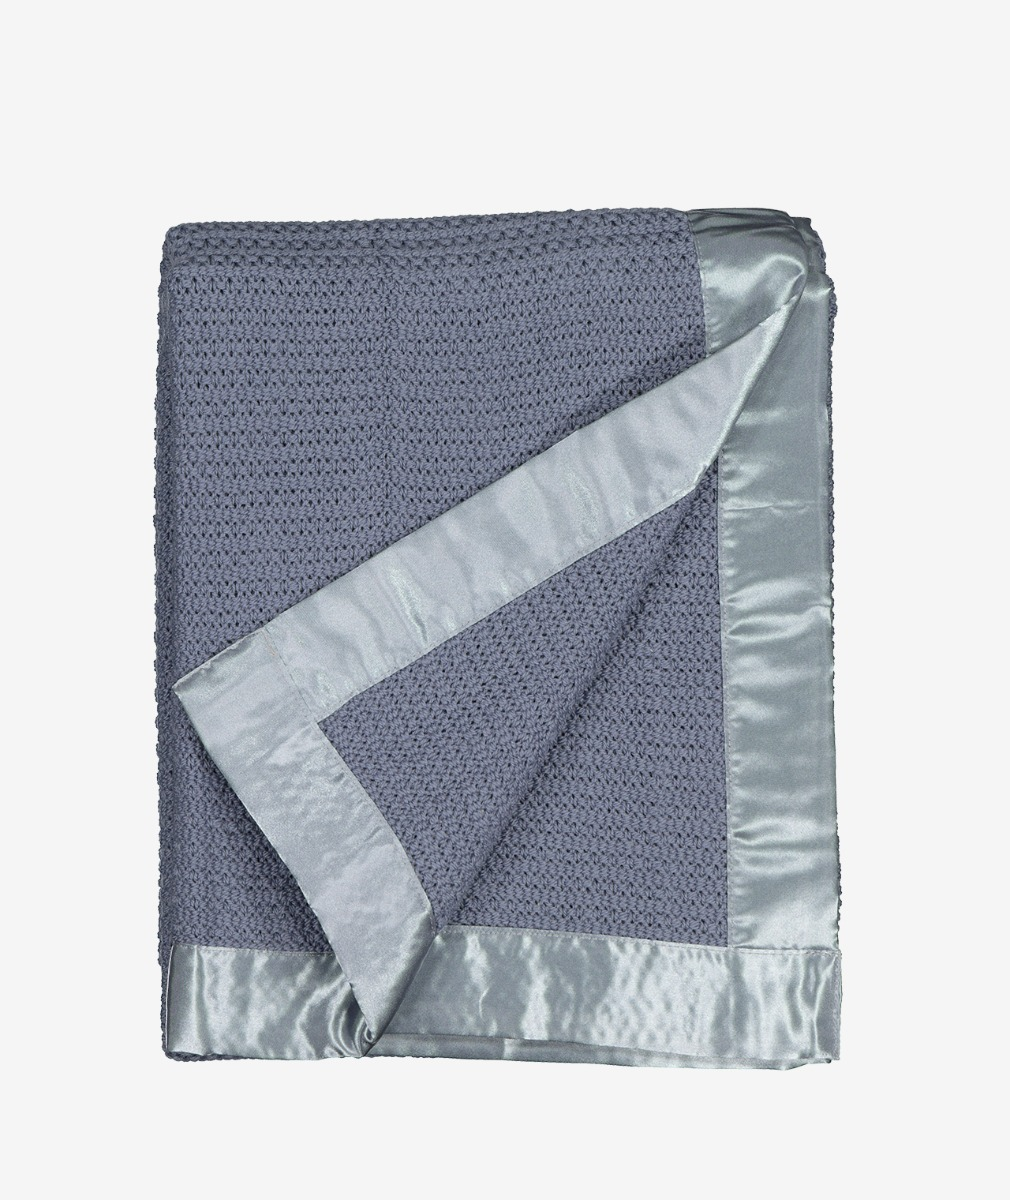 Swanndri Thermalweave Wool Cot Blanket in Grey